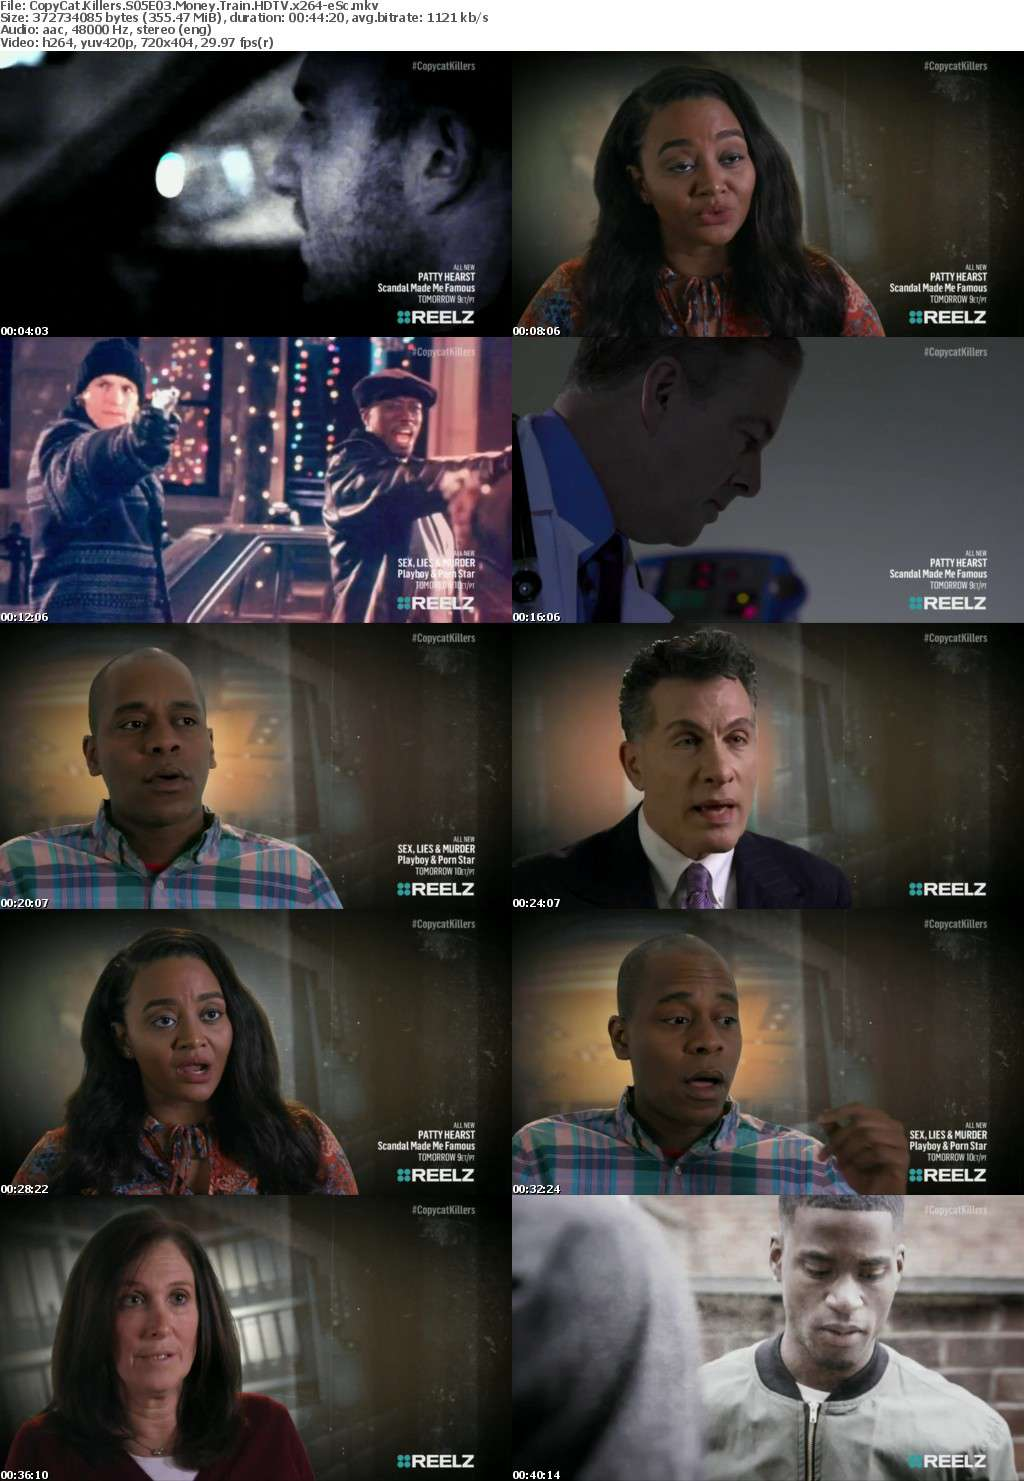 CopyCat Killers S05E03 Money Train HDTV x264-eSc